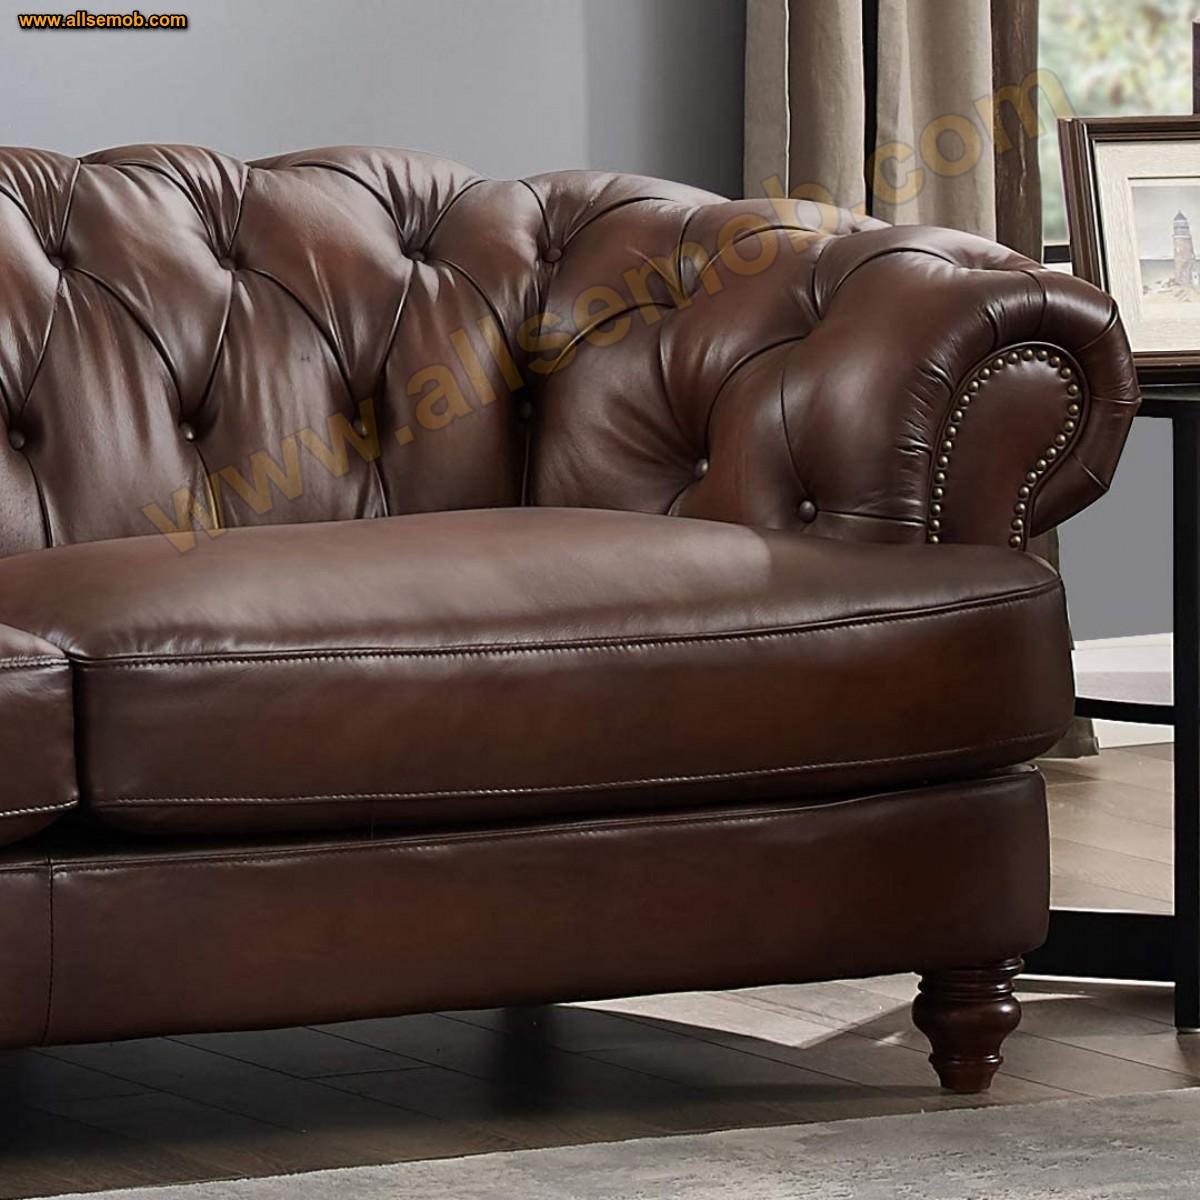 İkili Kahverengi Chester Deri Koltuk Takımı Ev Ofis Lüks Tasarım